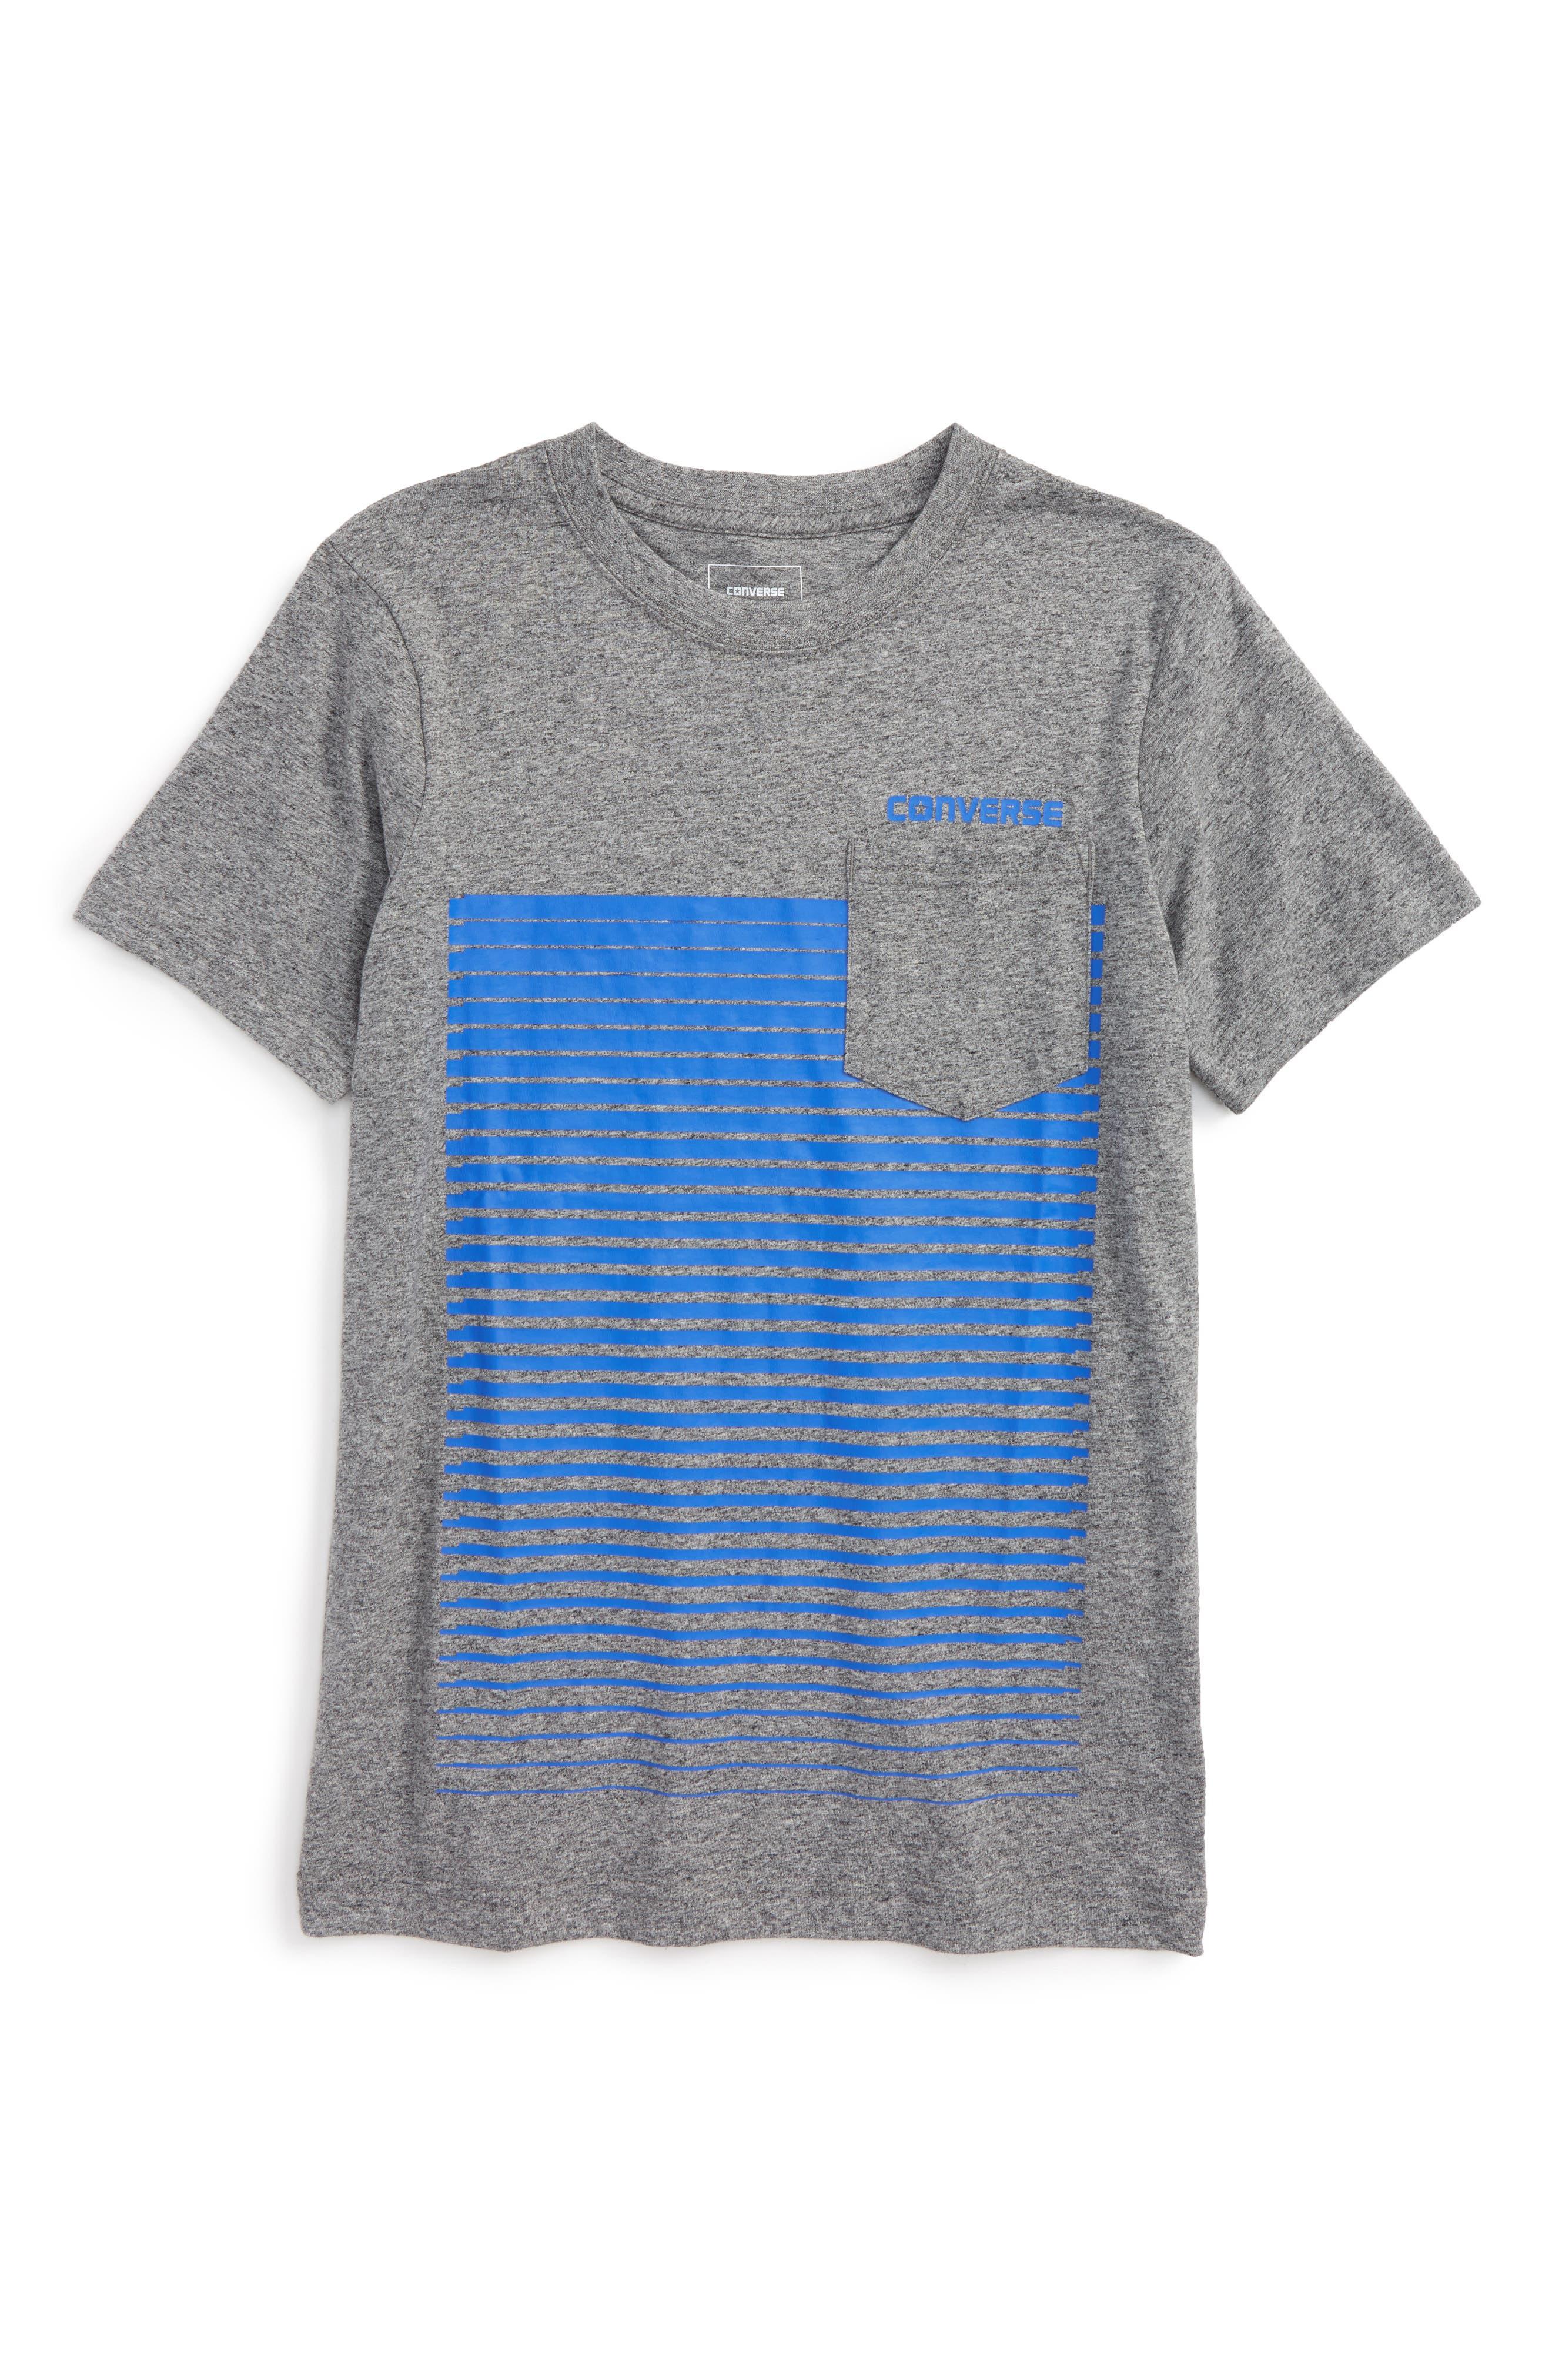 CONVERSE Linear Ombré Pocket T-Shirt